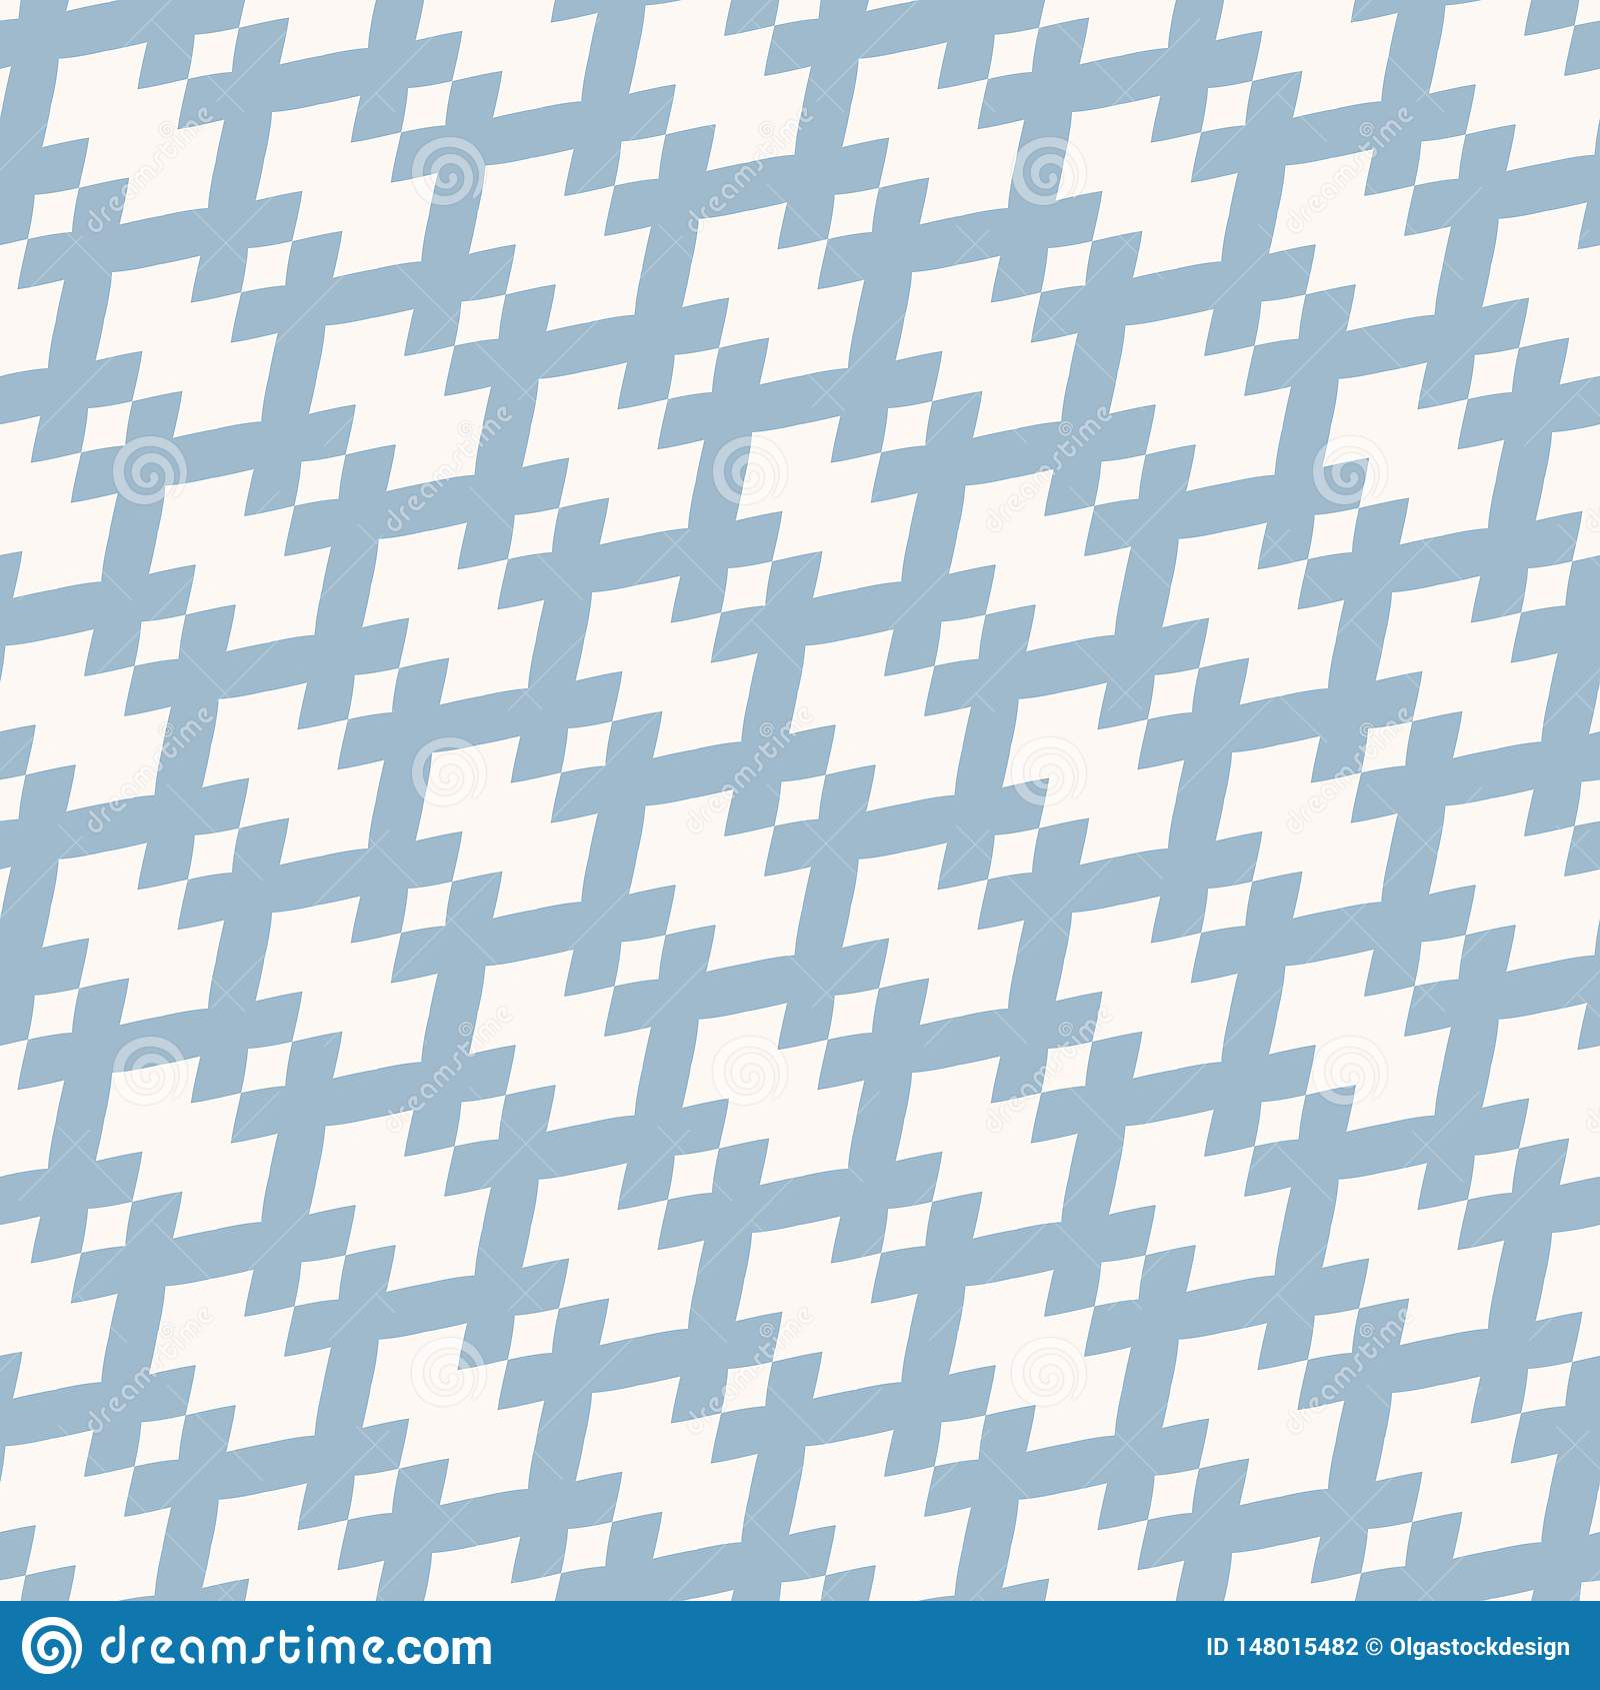 Vector geometric seamless pattern in traditional ethnic style. Tribal folk motif